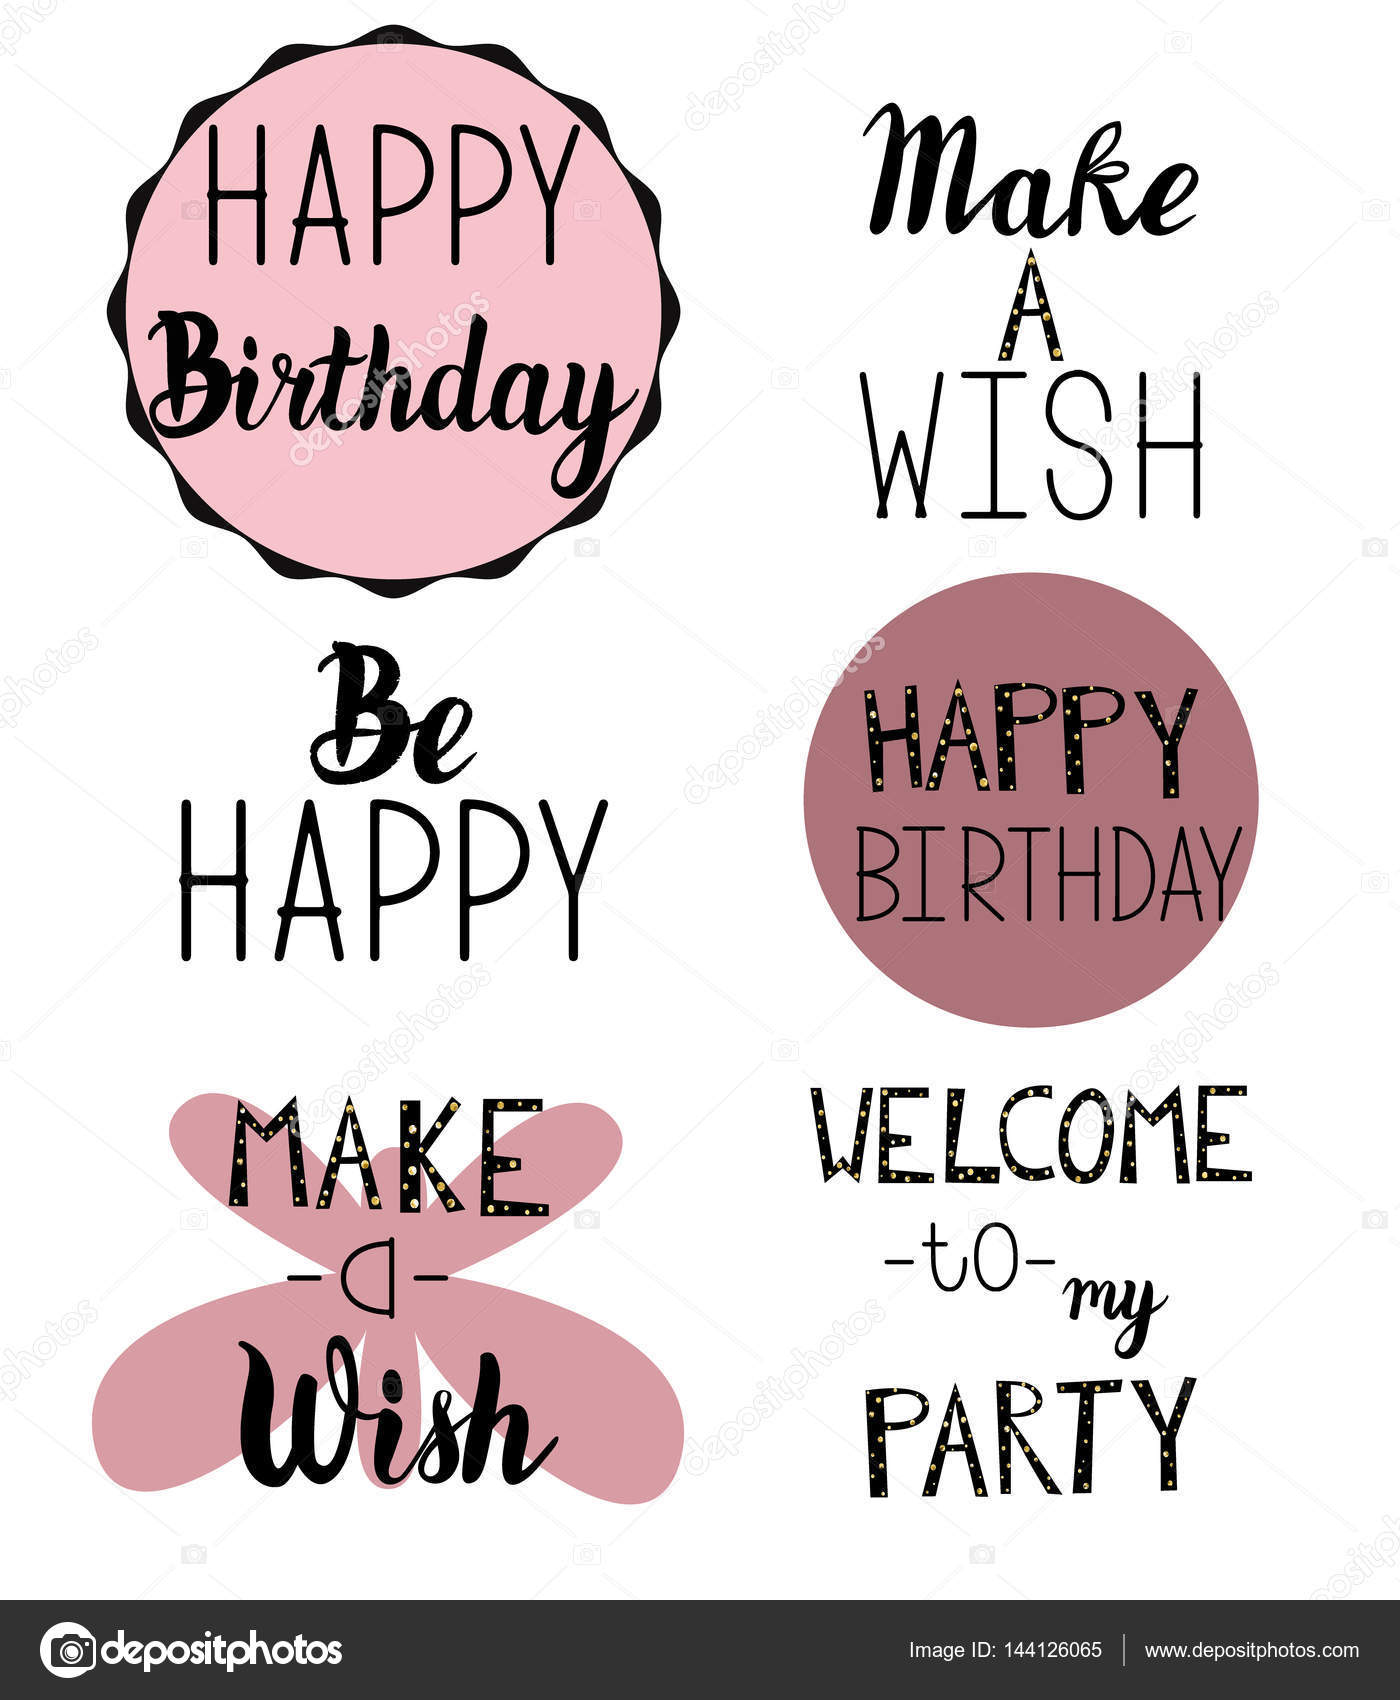 Gelukkige Verjaardag Groet Uitnodiging Tekst Stockvector